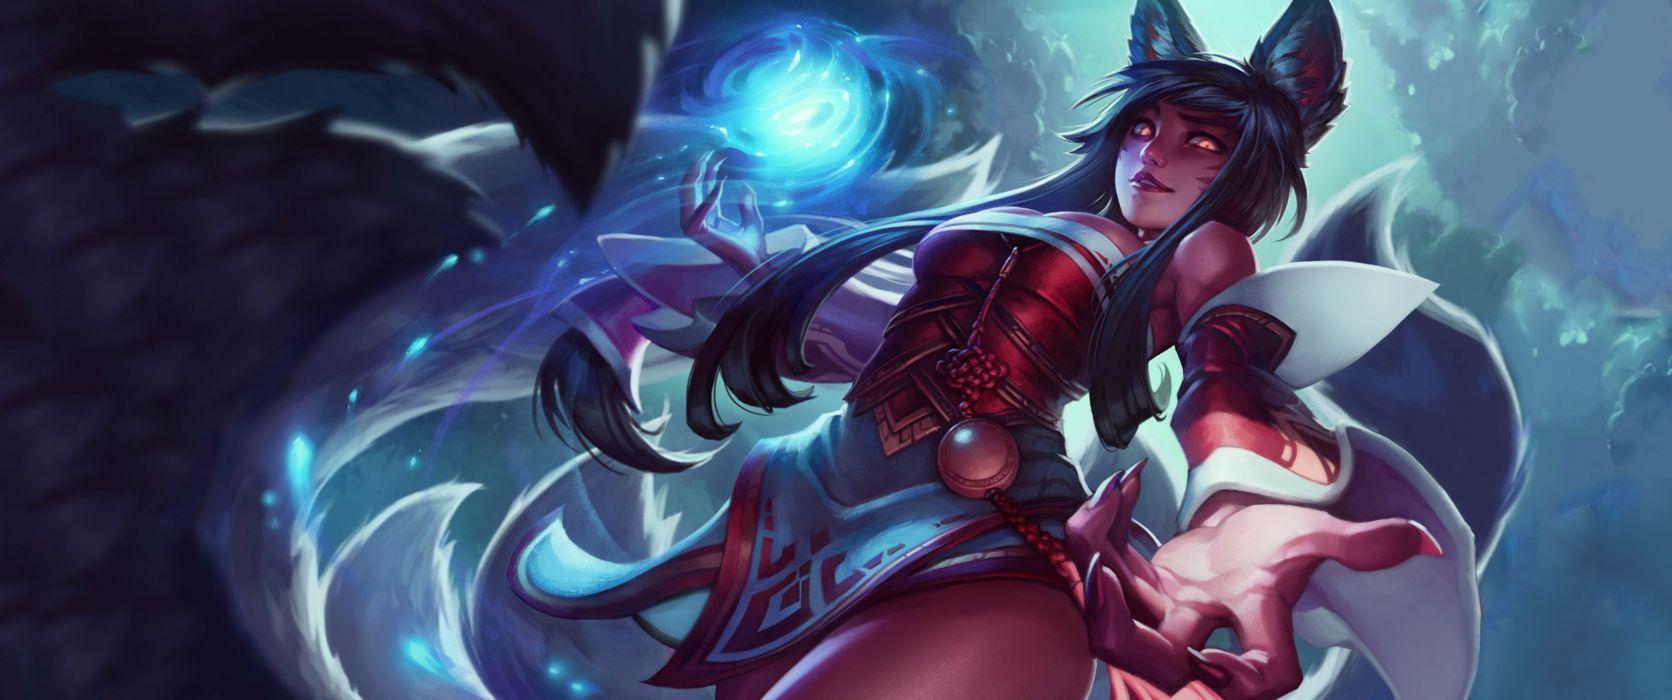 League Legends fantasy art artwork wallpaper